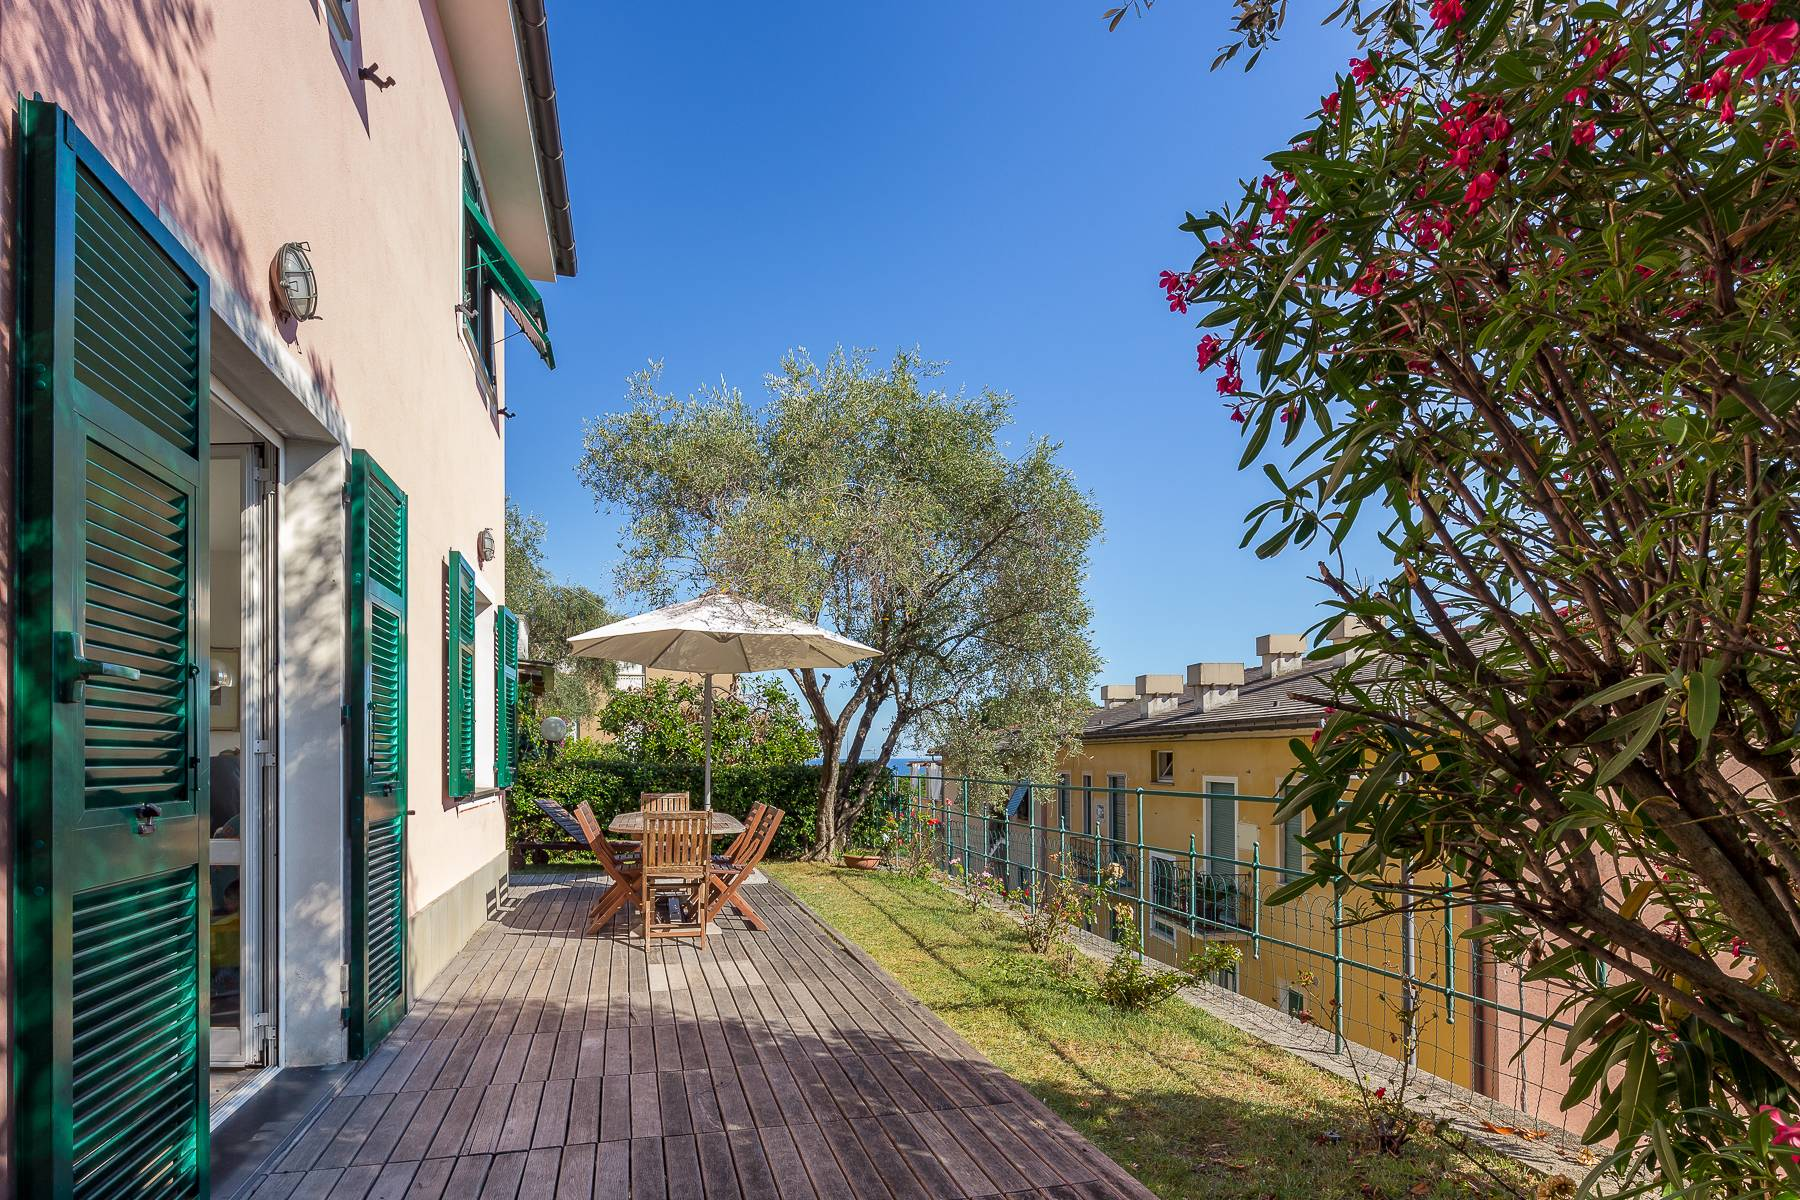 Casa indipendente in Vendita a Zoagli: 5 locali, 100 mq - Foto 29